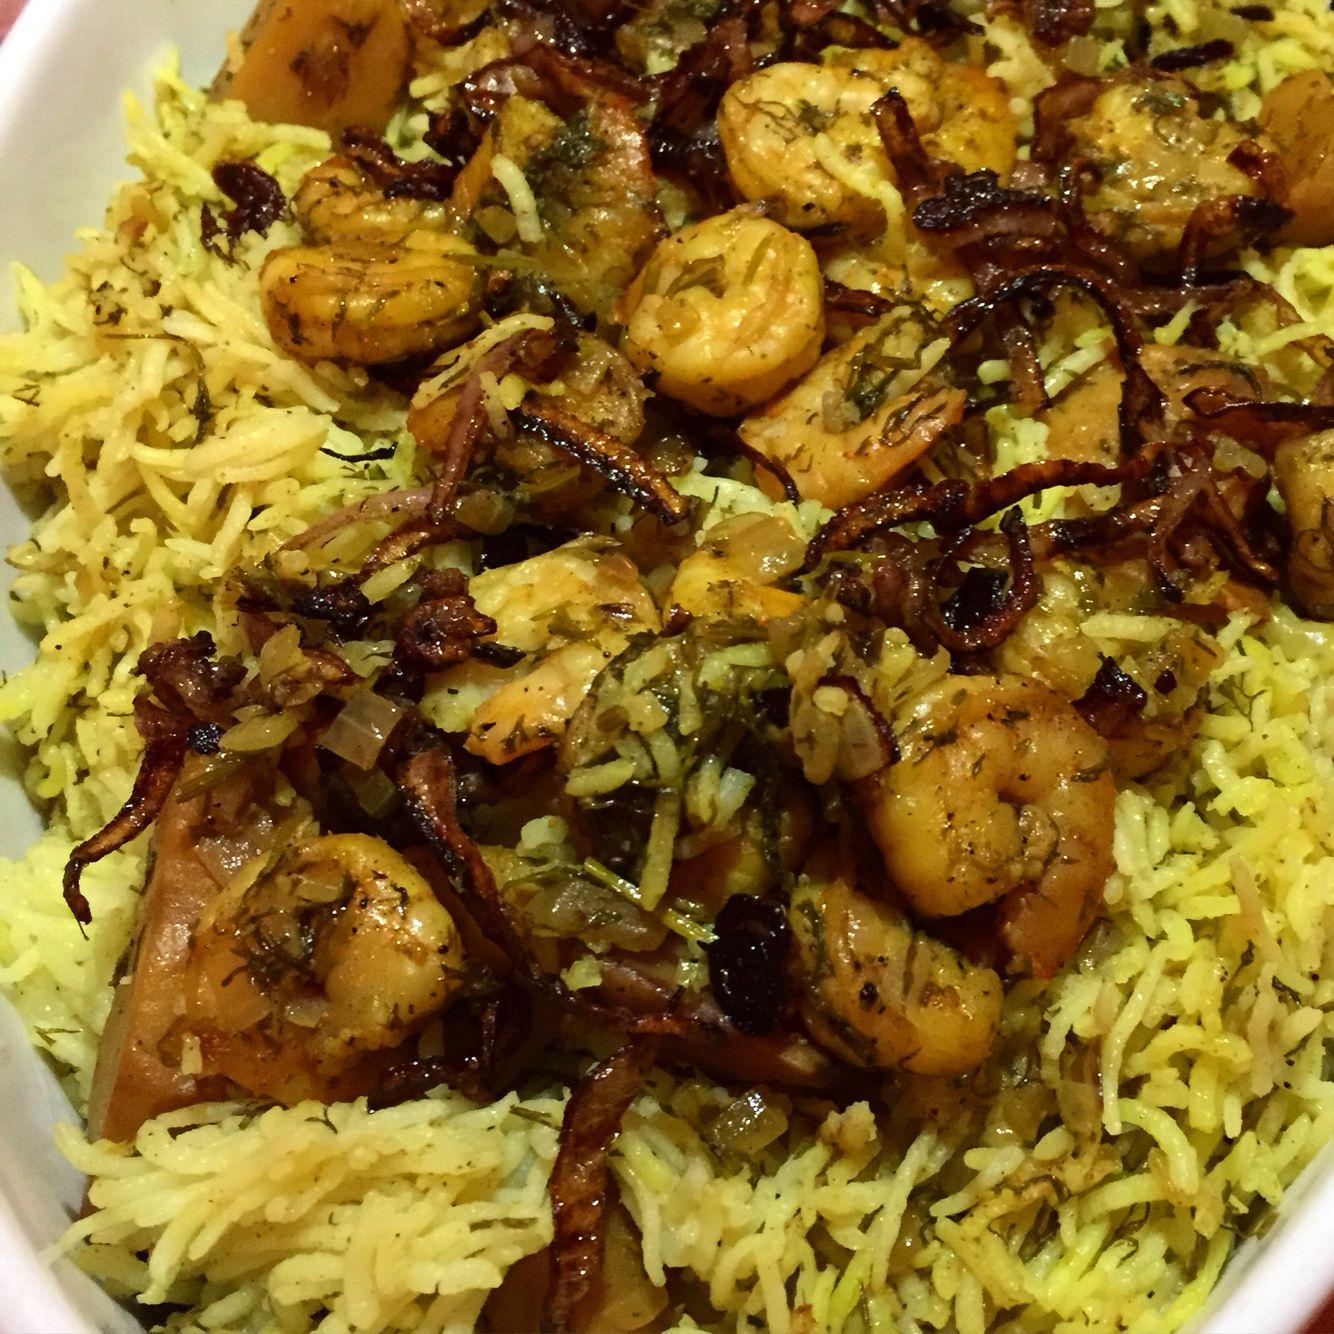 مربين بالفقع والشبنت Shrimp Pulao With Truffles And Dill Middle Eastern Recipes Food Food And Drink